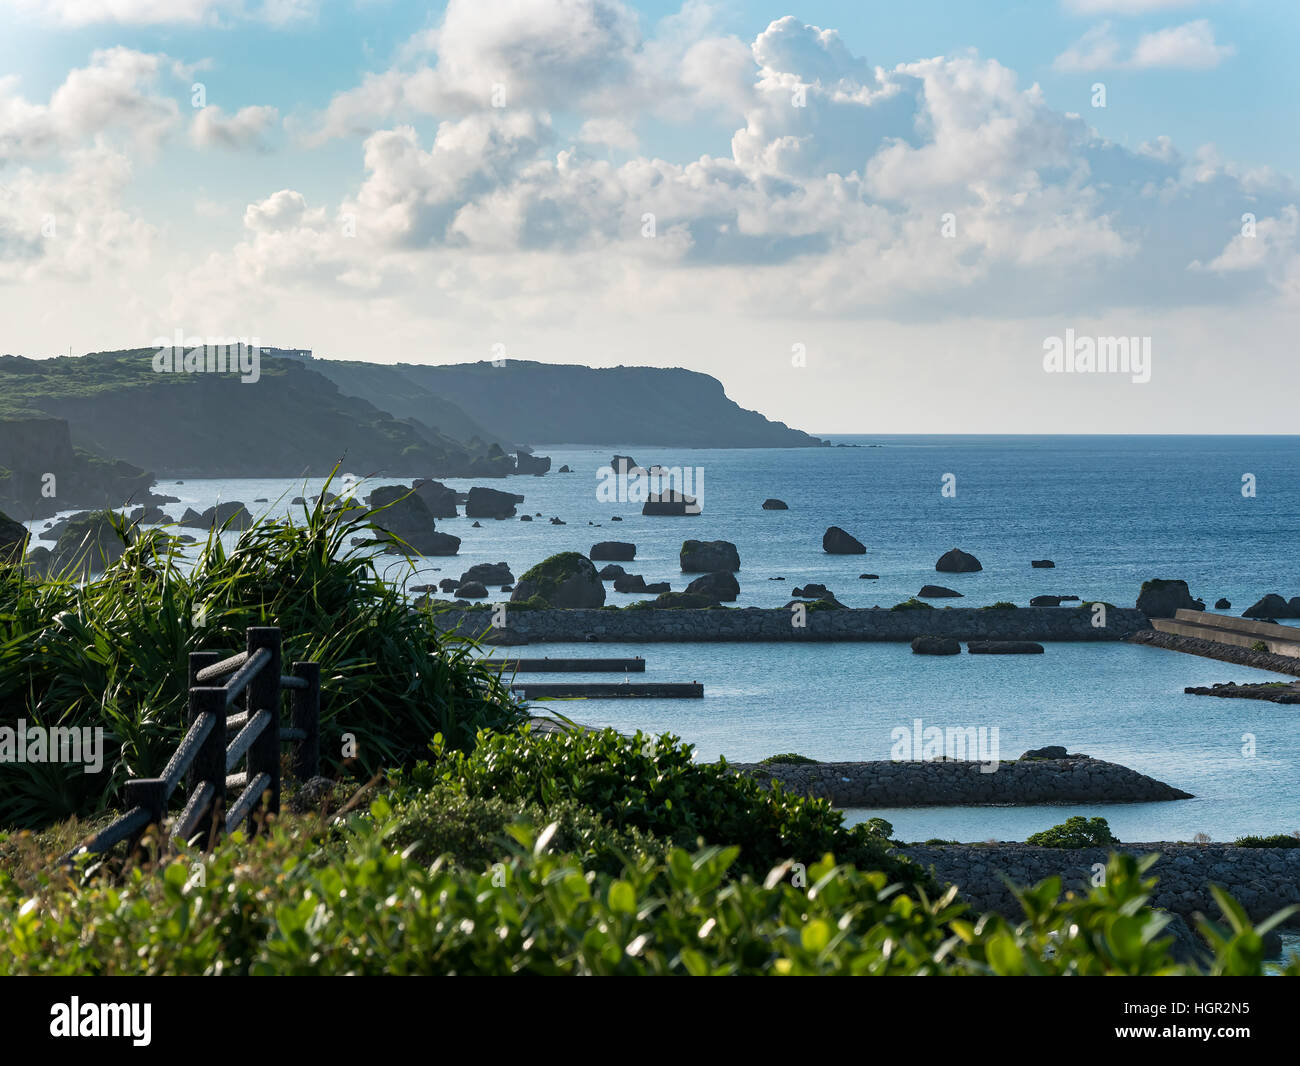 Cape of Higashi Henna Zaki of Miyako Island in Okinawa, Japan. - Stock Image